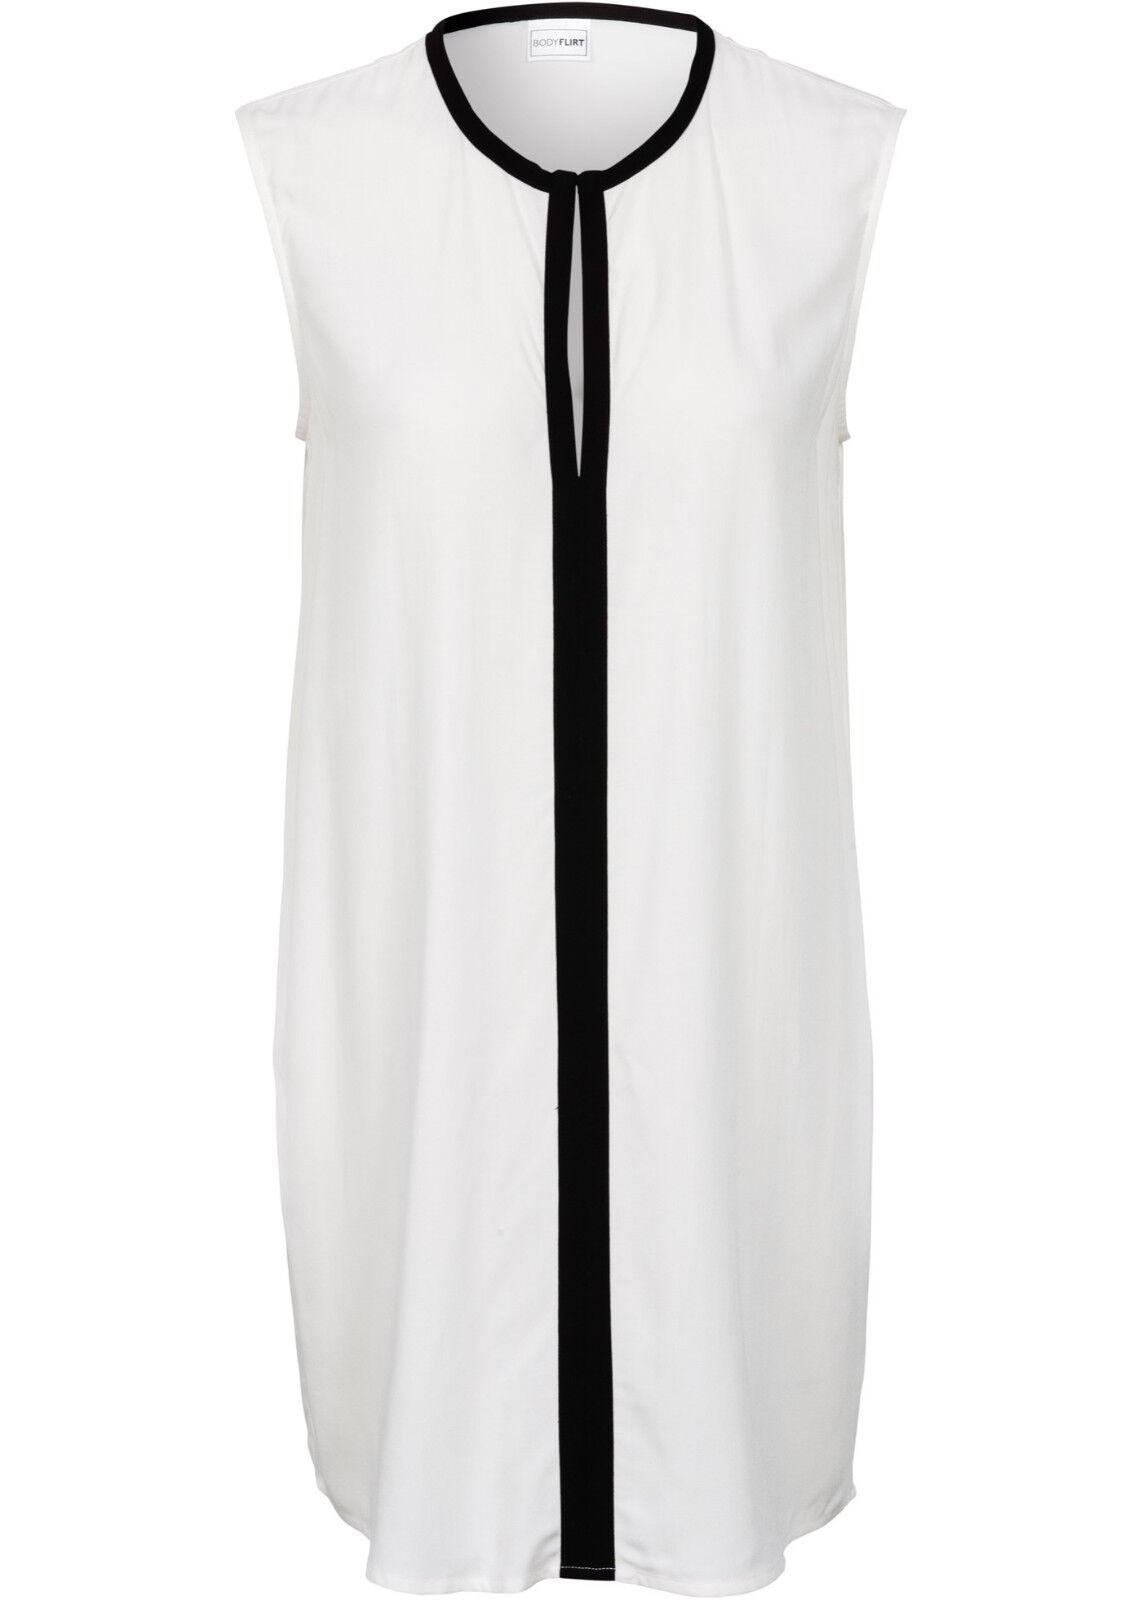 Damen Top Bluse weiß schwarz figurumspielend edel  XS S M L XL XXL neu 941